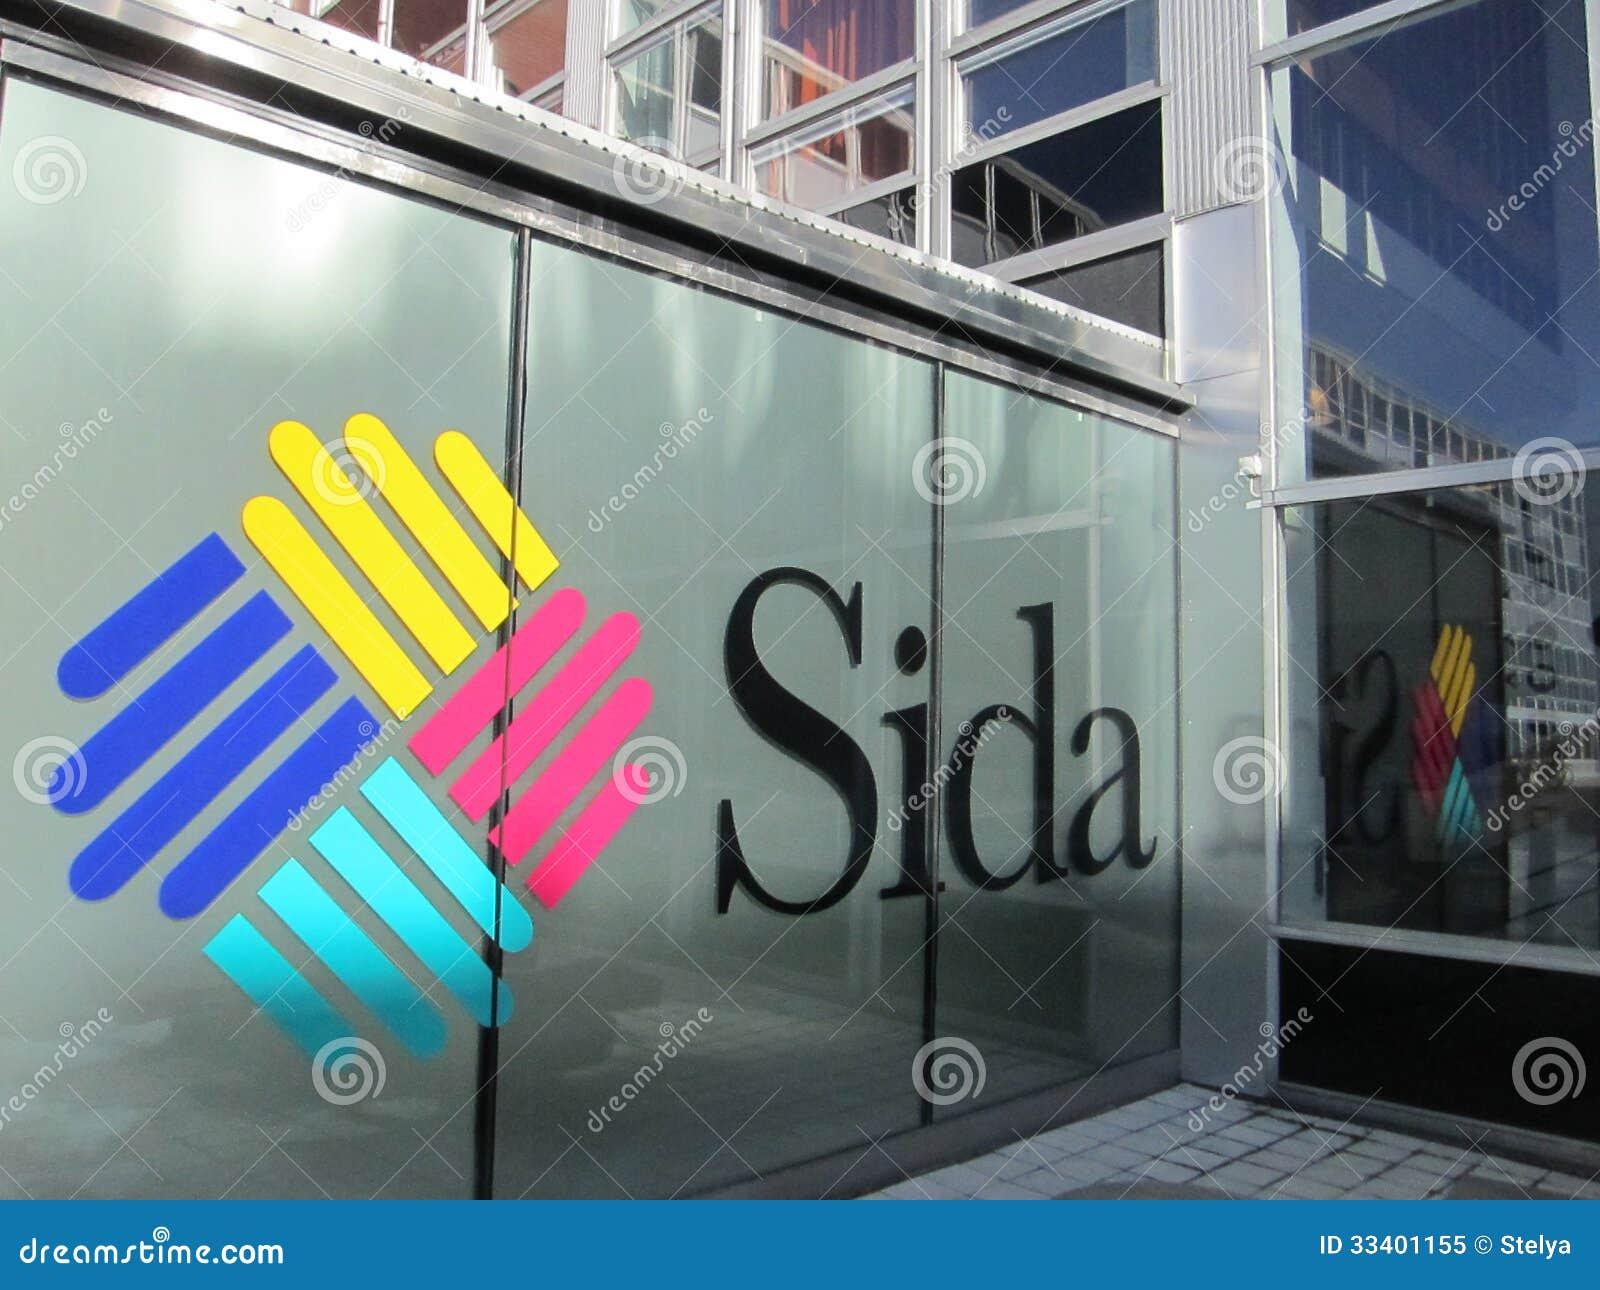 SIDA- Swedish International Development Cooperation Agency